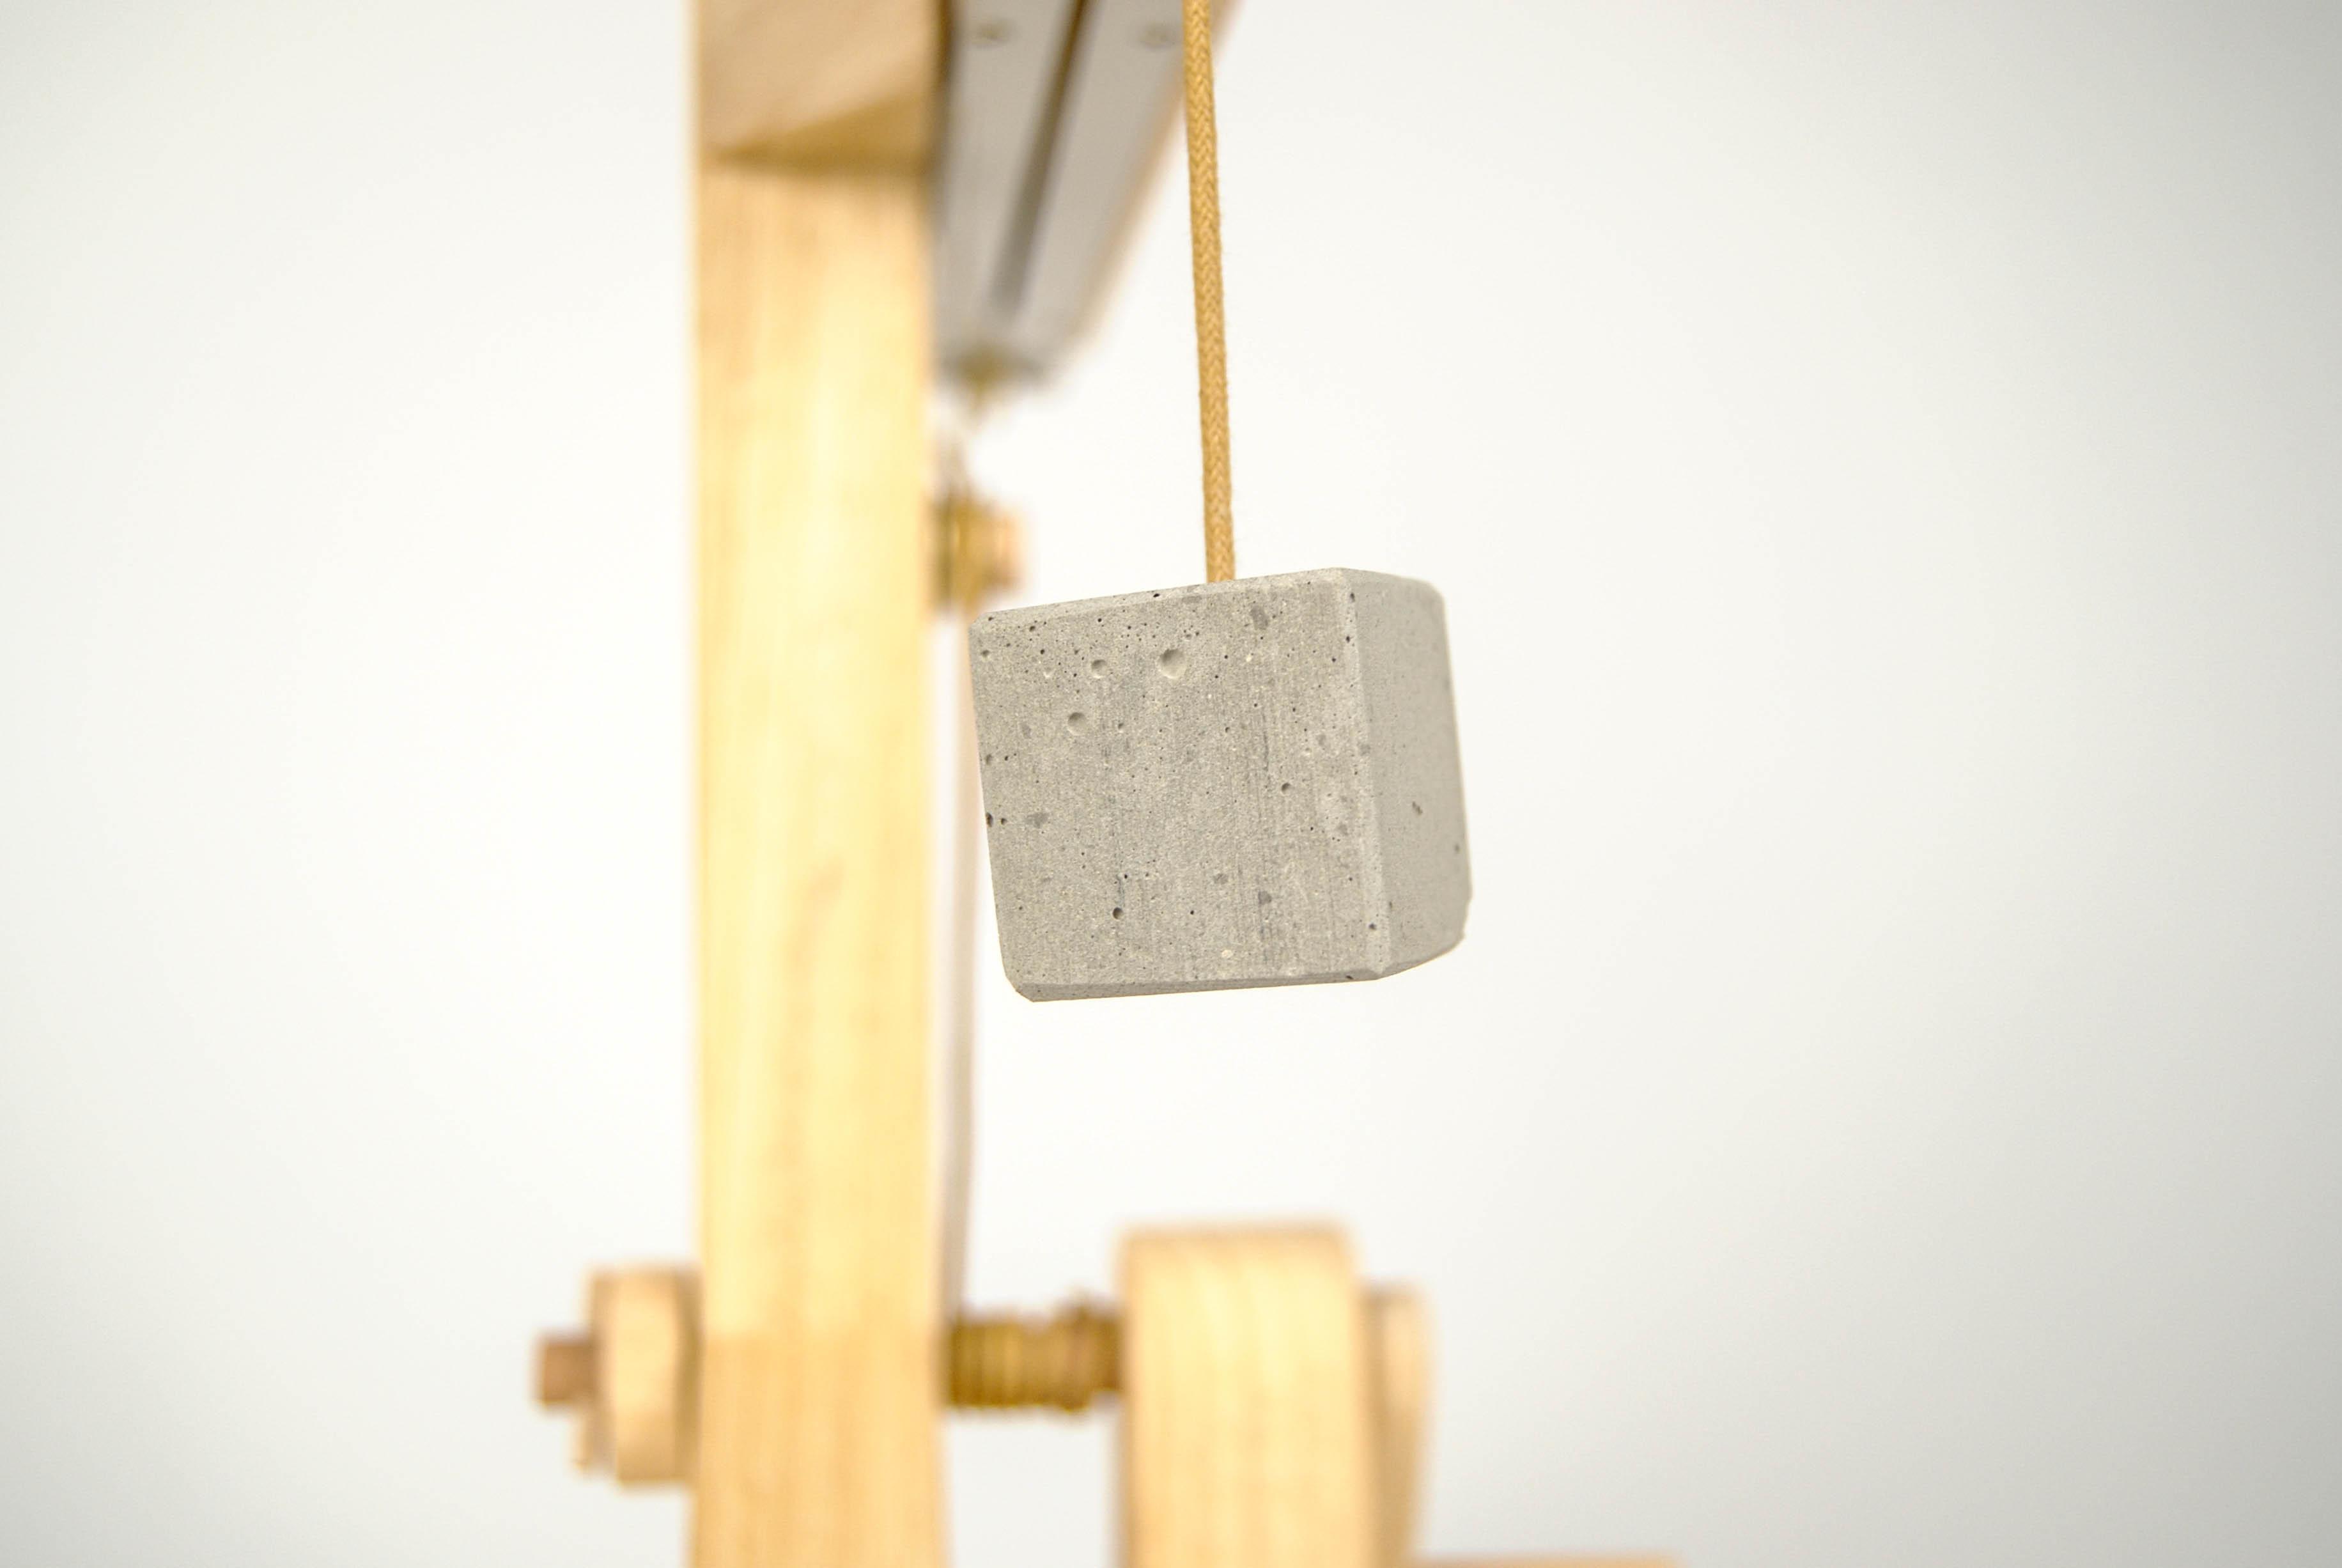 leonardo da vinci wooden calendar with wire and stone for the date